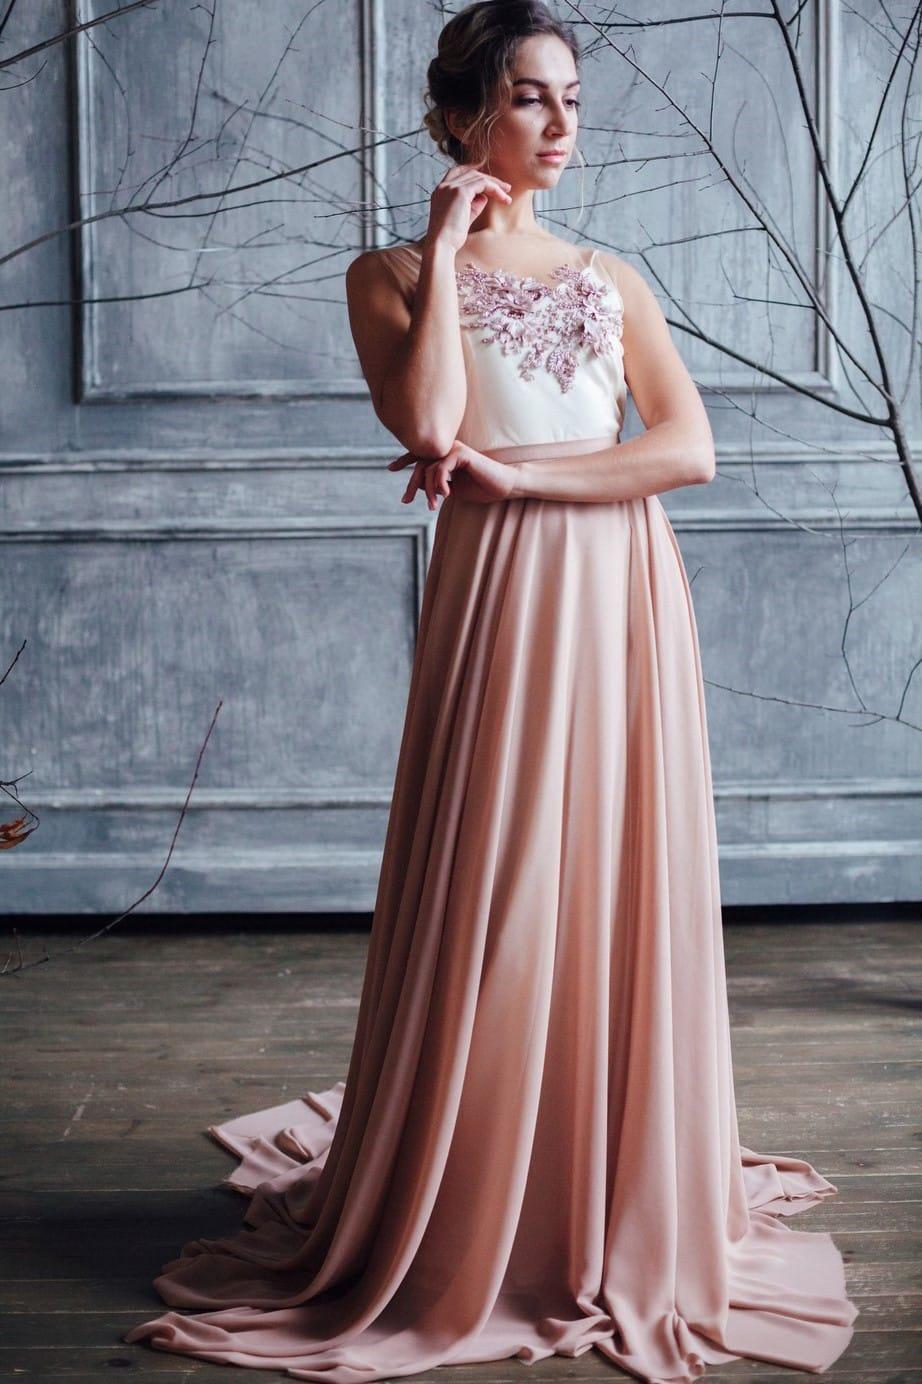 Вечернее платье GRANDY, коллекция FLOWER MAGIC, бренд RARE BRIDAL, фото 1